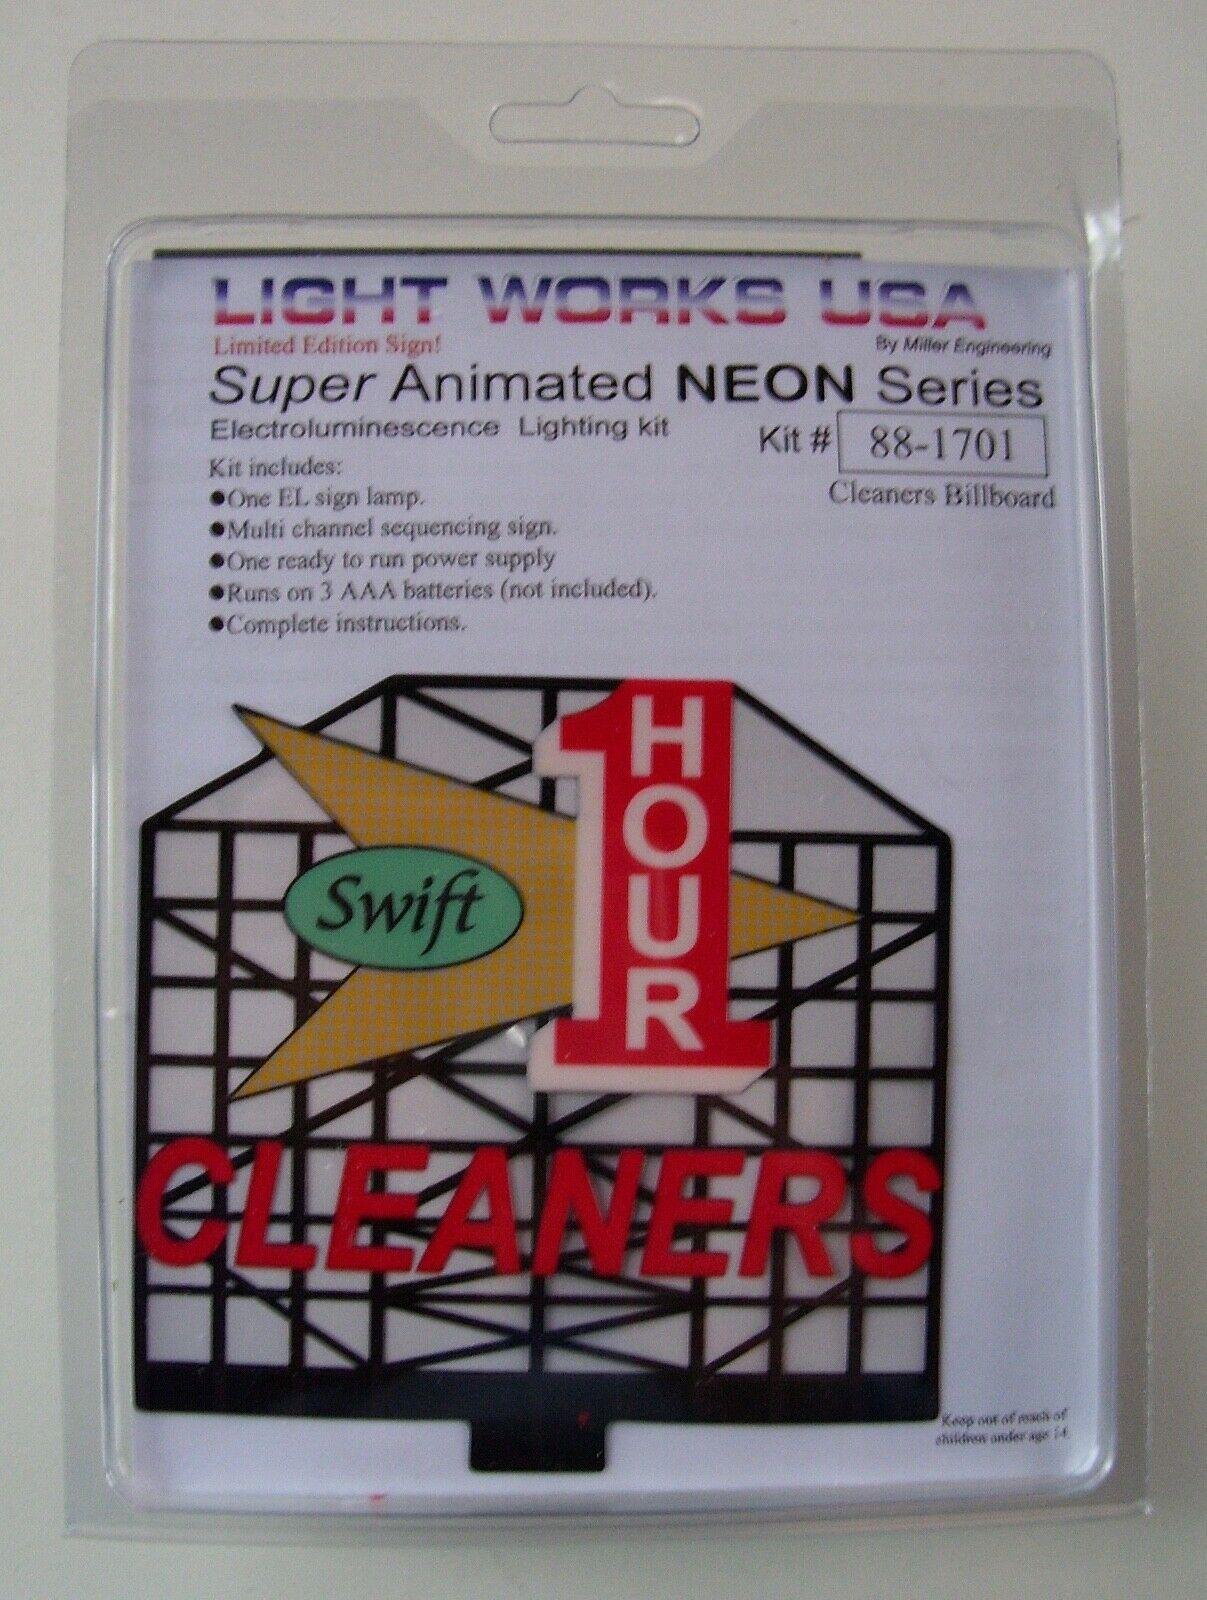 Light Works USA by Miller Engineering 88-1701 1 Hour Cleaners Billboard NIB